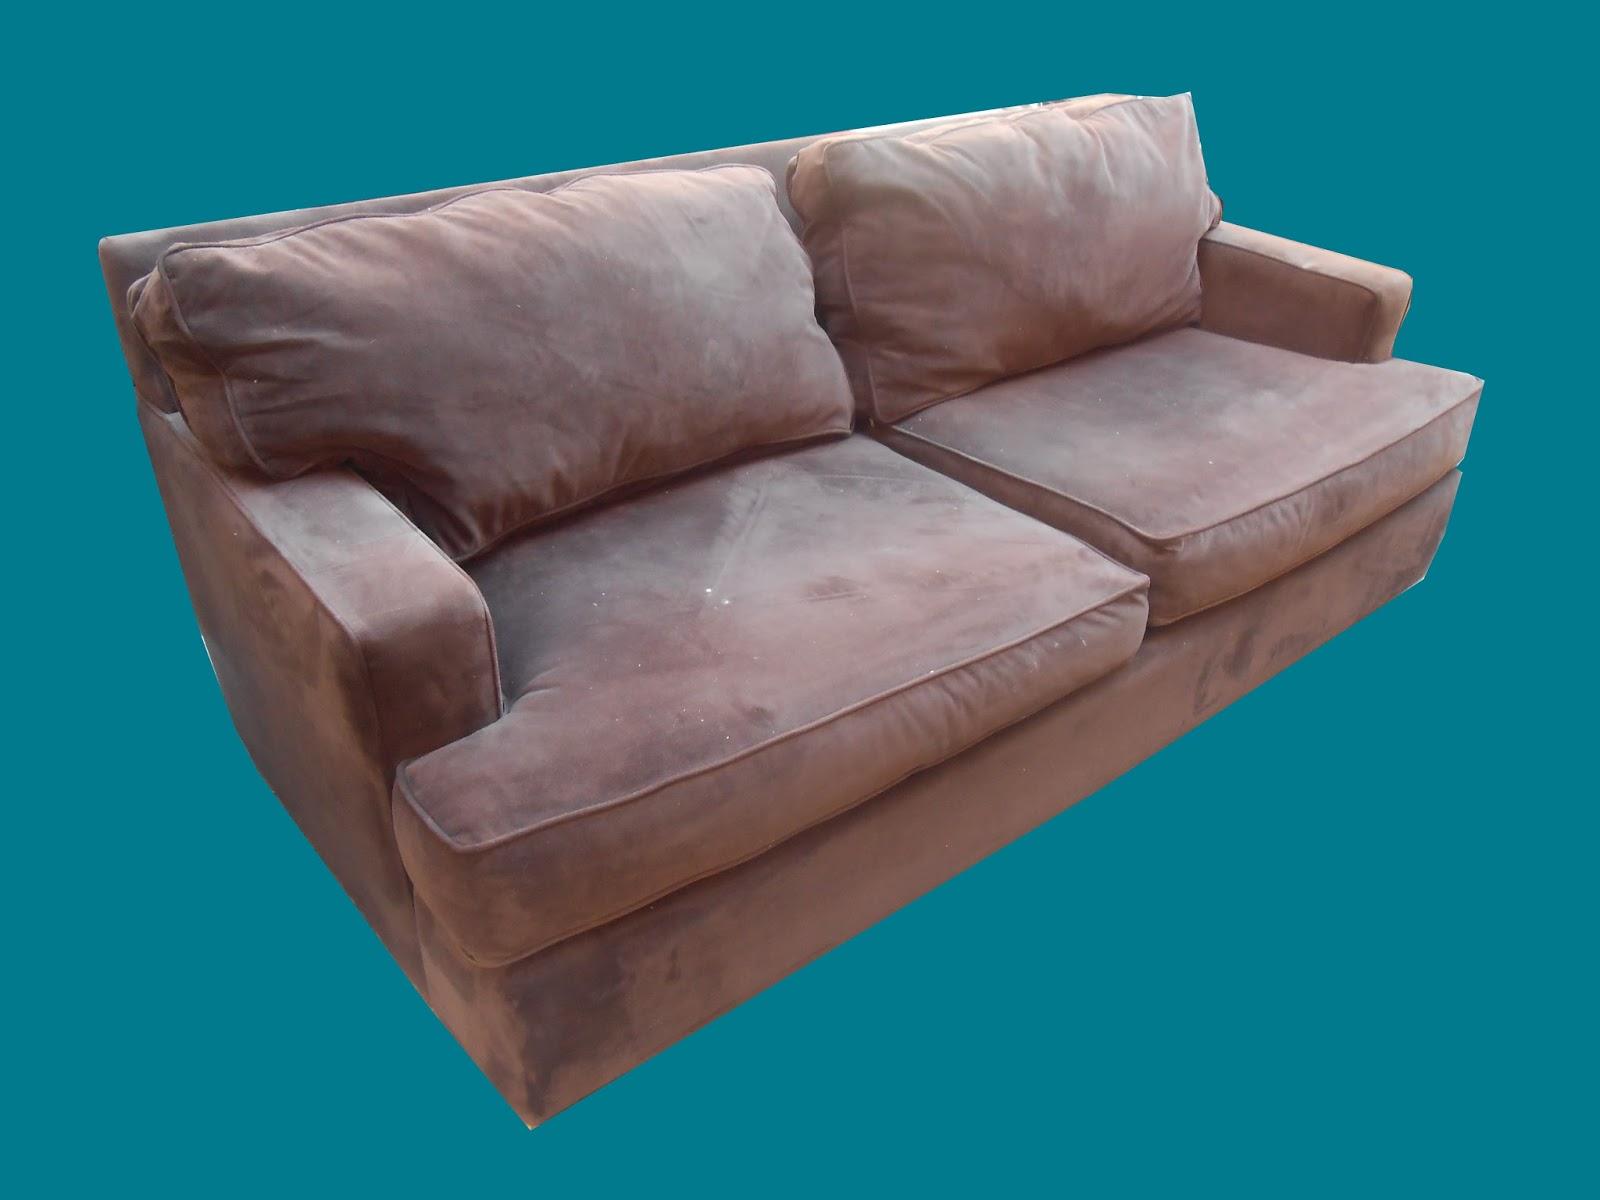 Uhuru Furniture & Collectibles: Dark brown microfiber couch ...